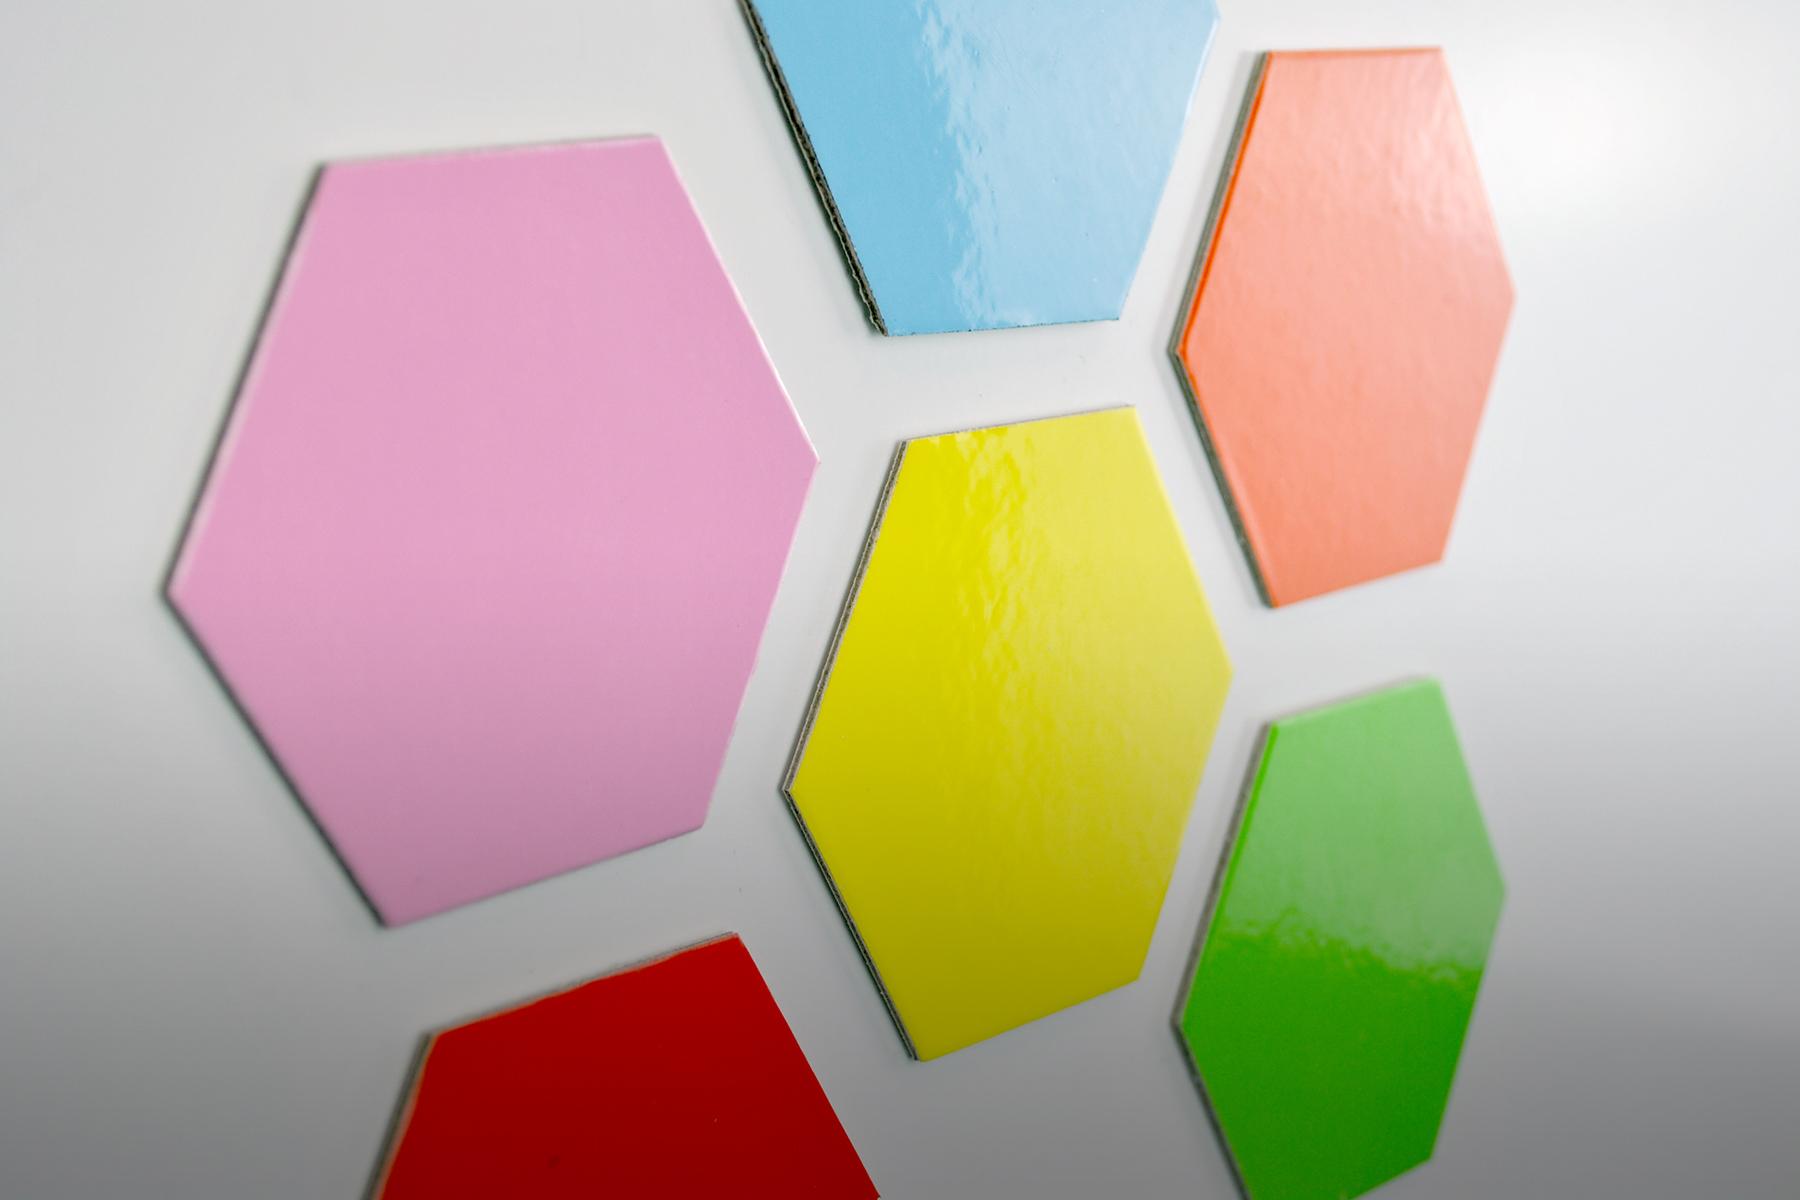 https://www.logovisual.com/wp-content/uploads/2021/08/Magnote-Hexagons-2.jpg